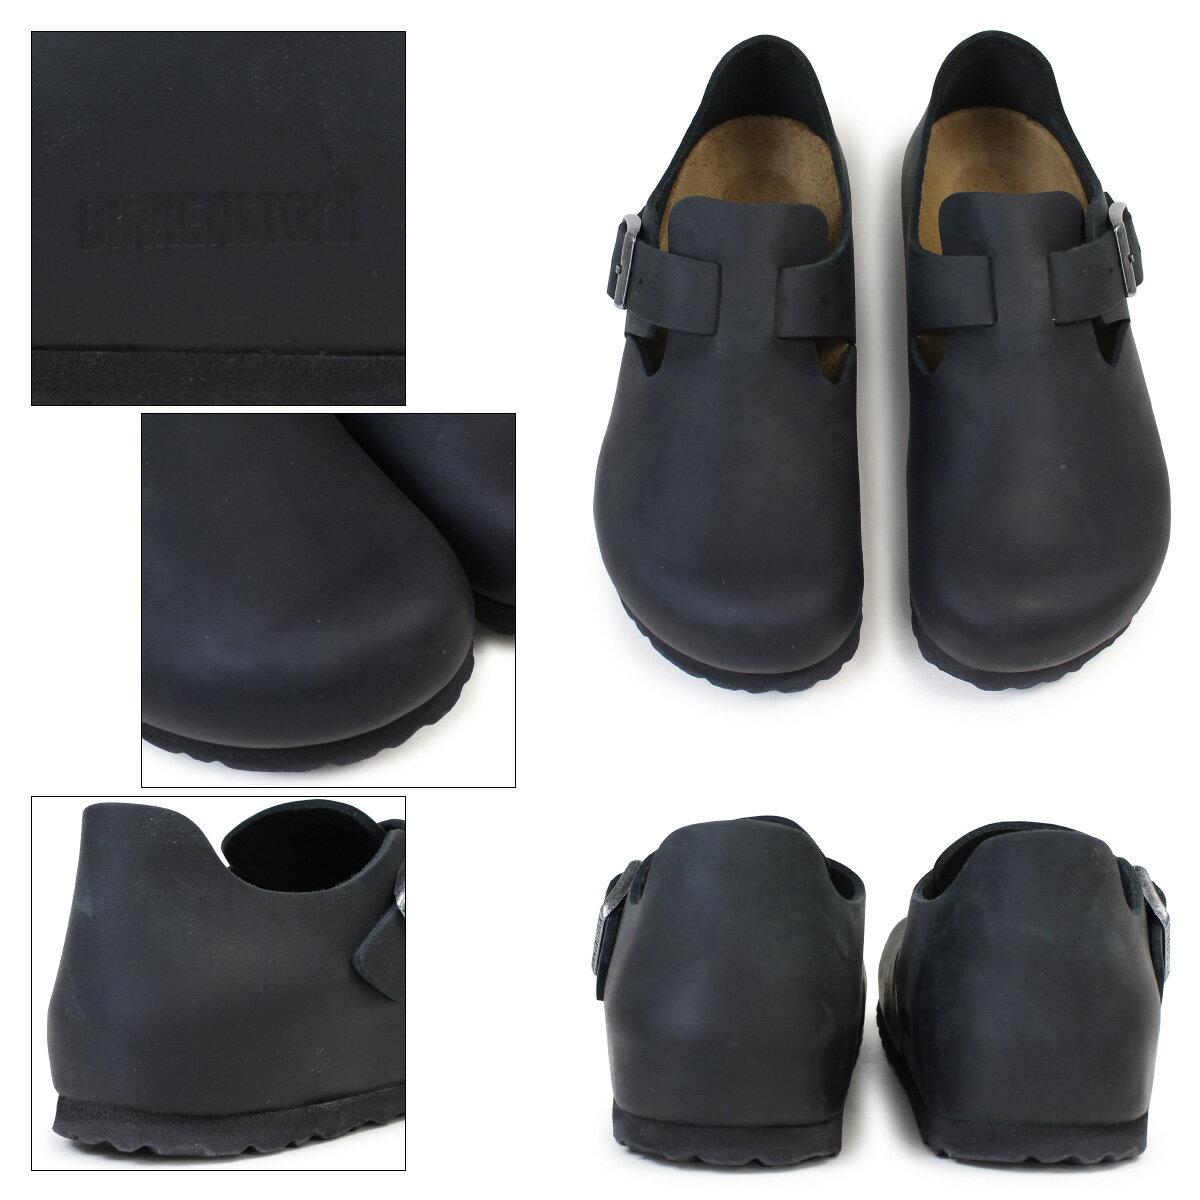 Width usually thin ビルケンシュトック BIRKENSTOCK London men gap Dis LONDON building Ken sandals slip ons